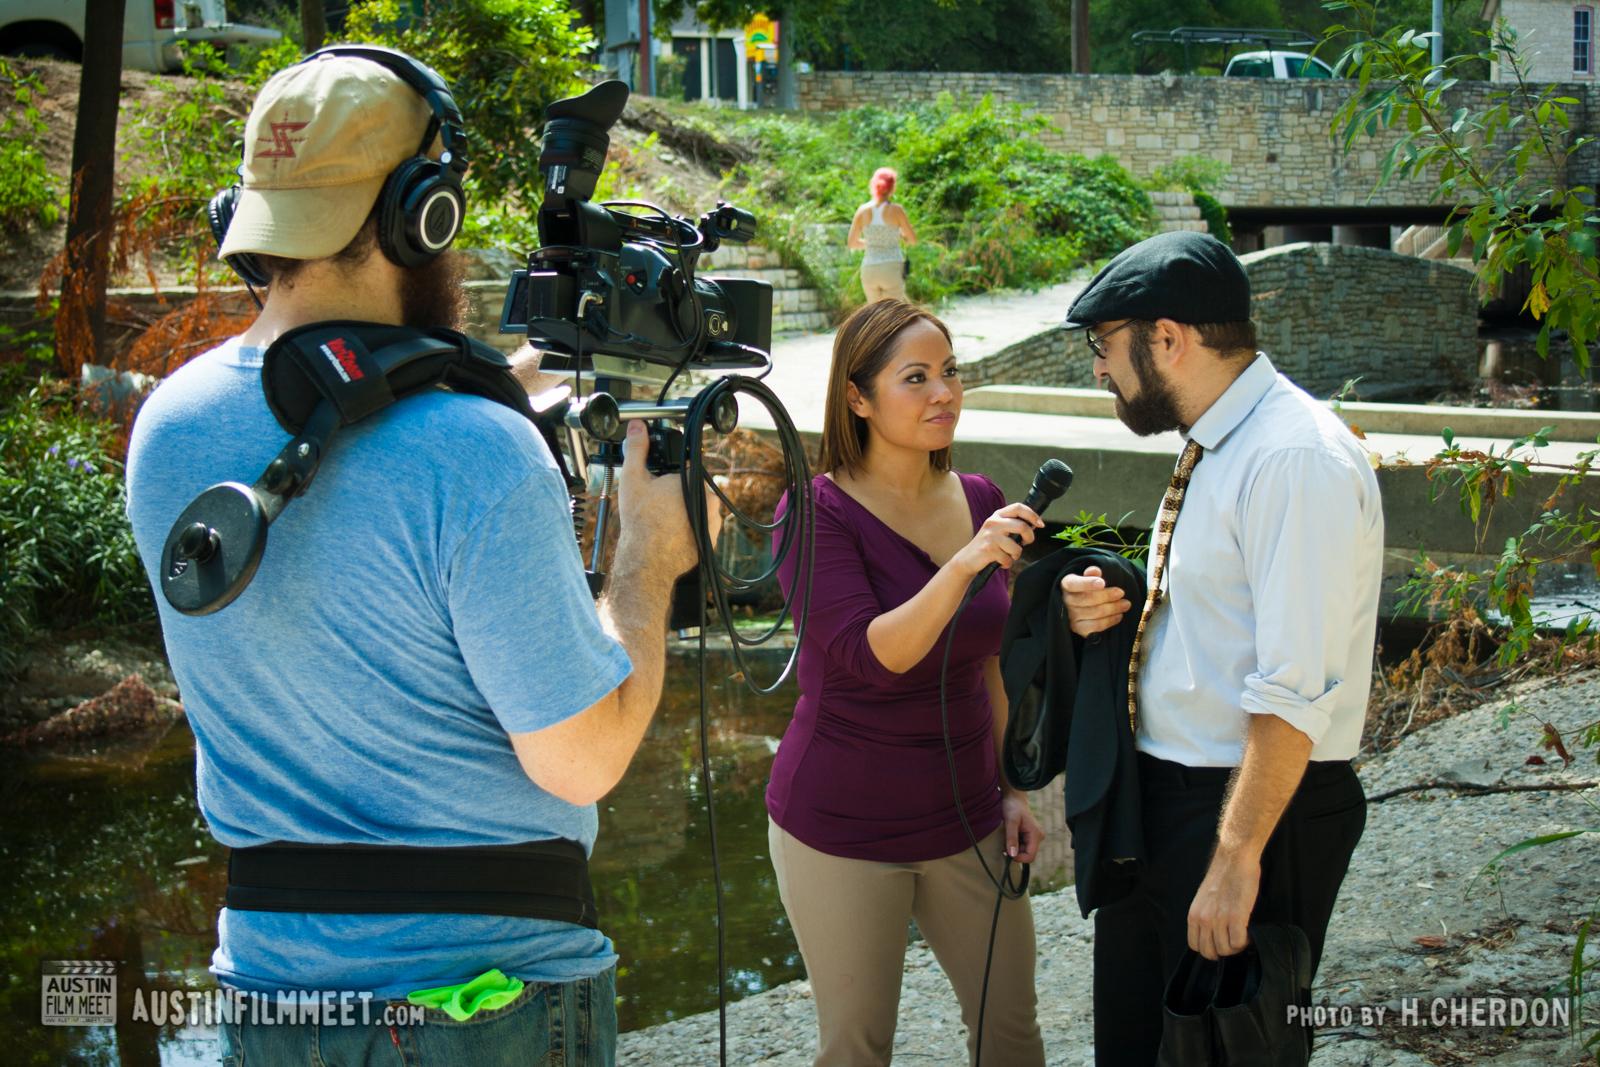 Lorelei Supapo - Video Host